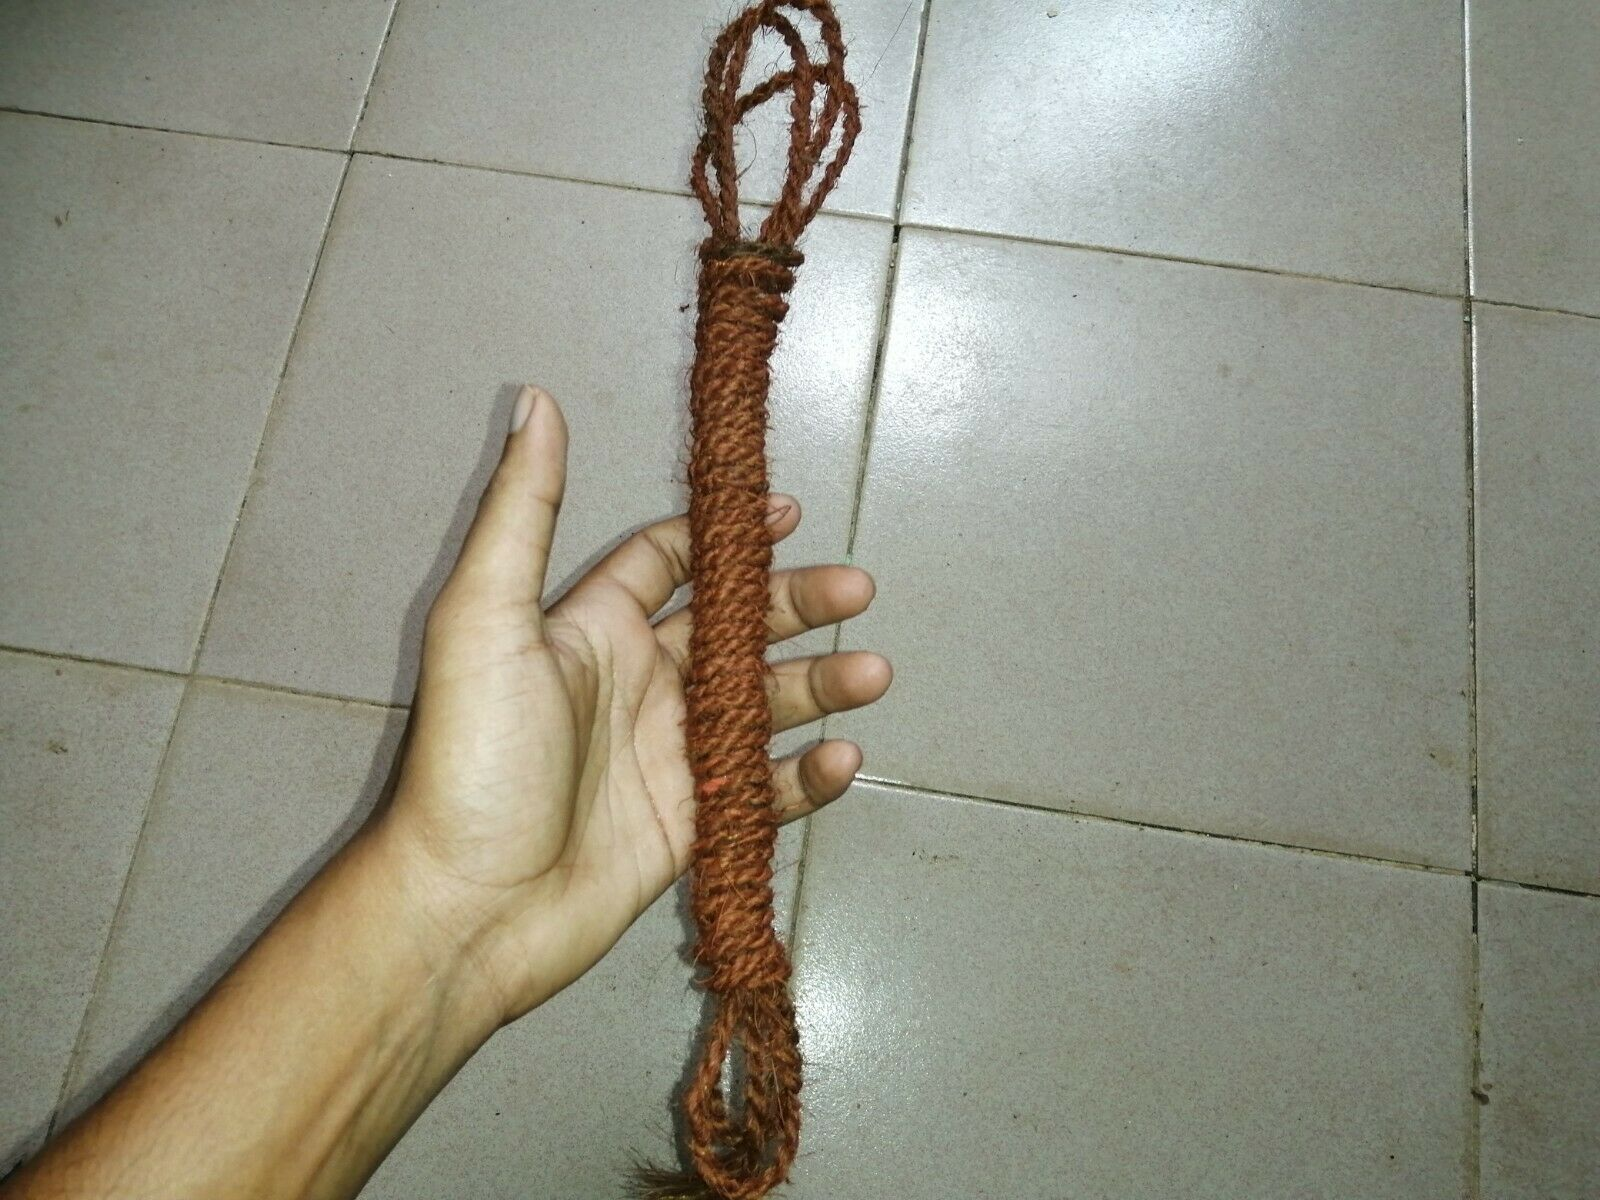 Coconut Husk Fiber Rope Handmade Coir Twisted Red Color Christmas Decor Craft